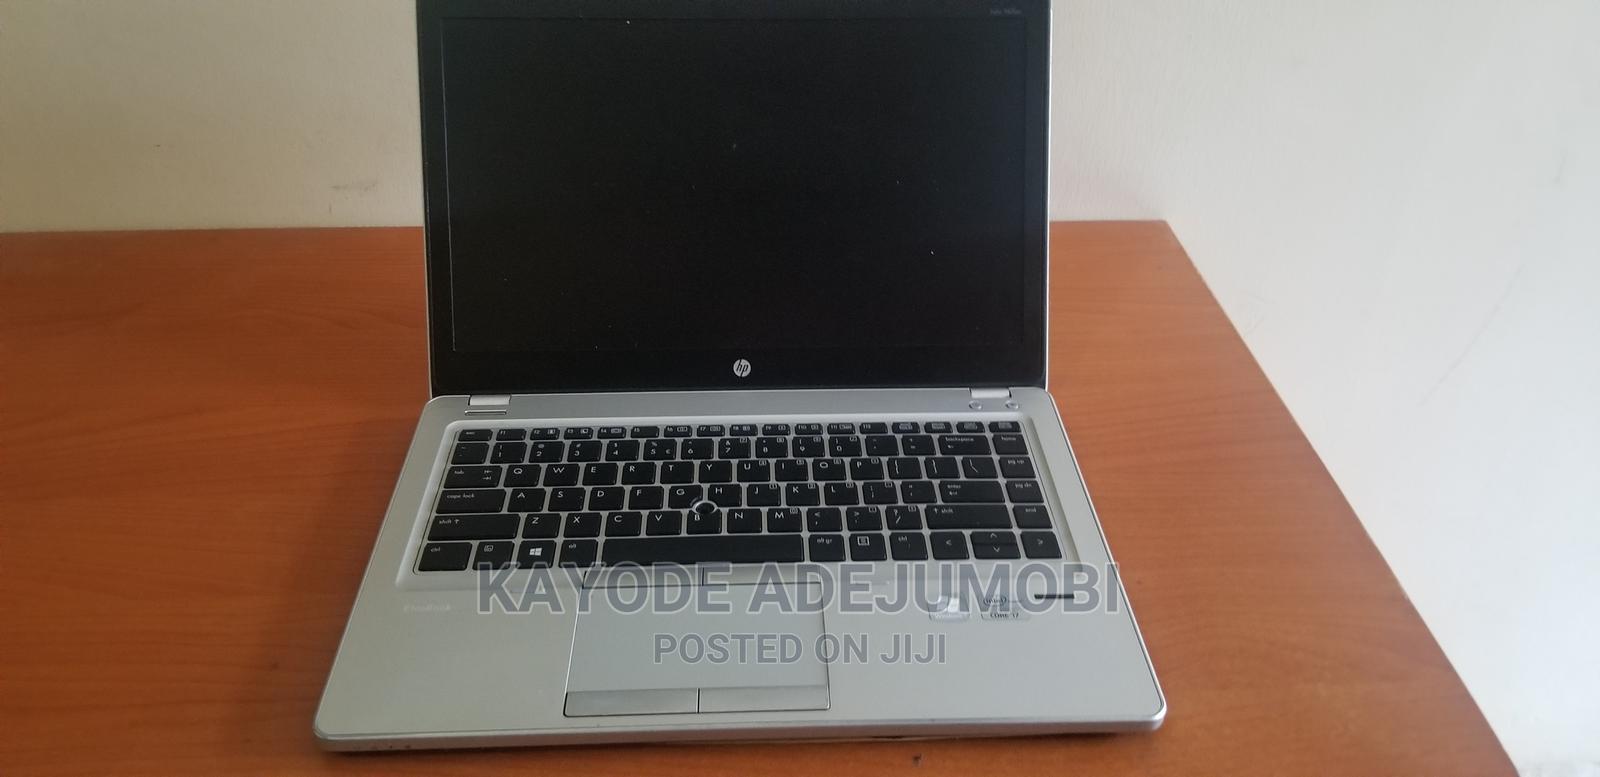 HP Elitebook Folio 9470M 8gb Core I7 500gb | Computer Hardware for sale in Ikoyi, Lagos State, Nigeria